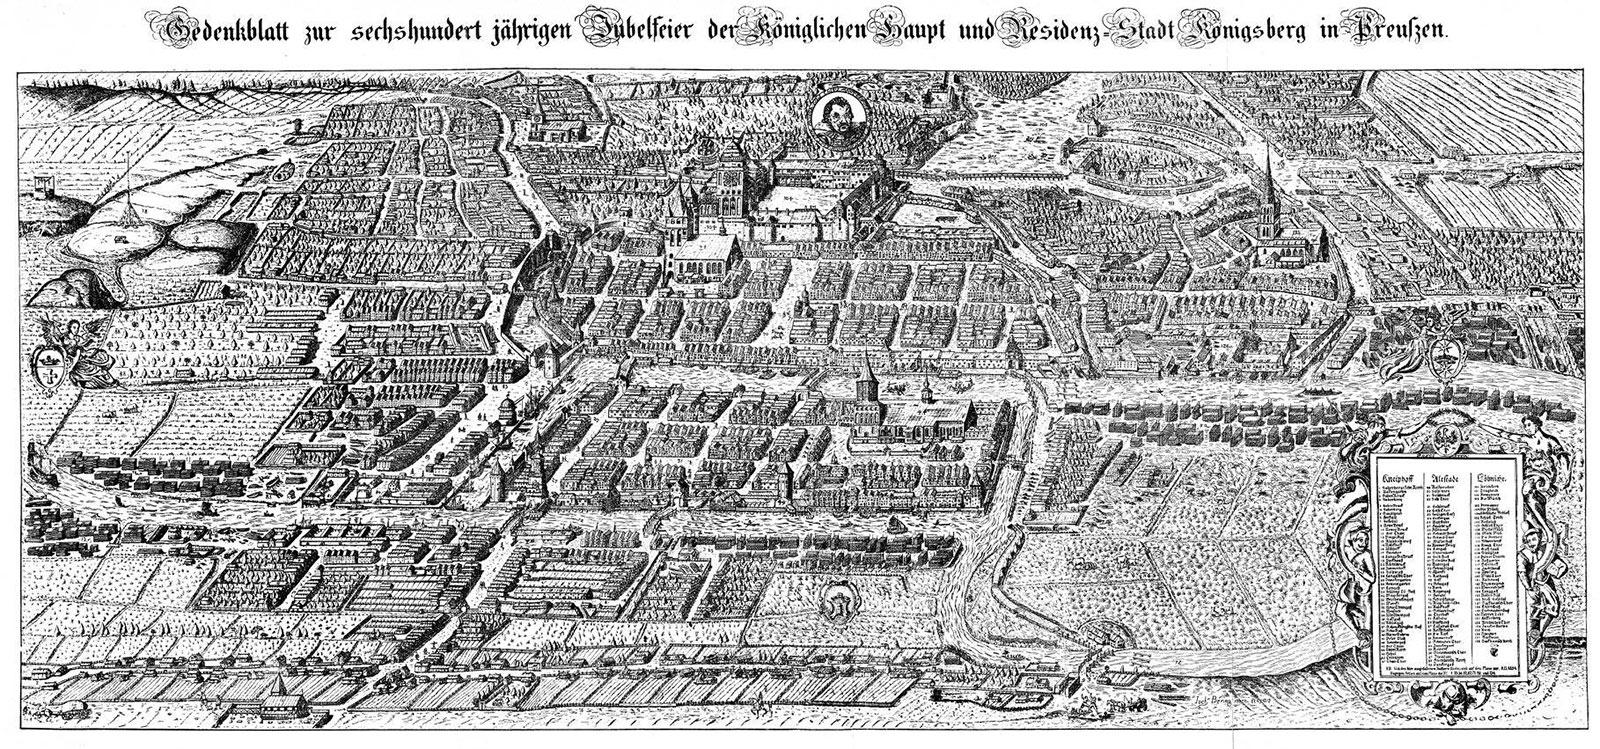 Królewiec (Koenigsberg), Mapy Merian-Erben, 1631–1652